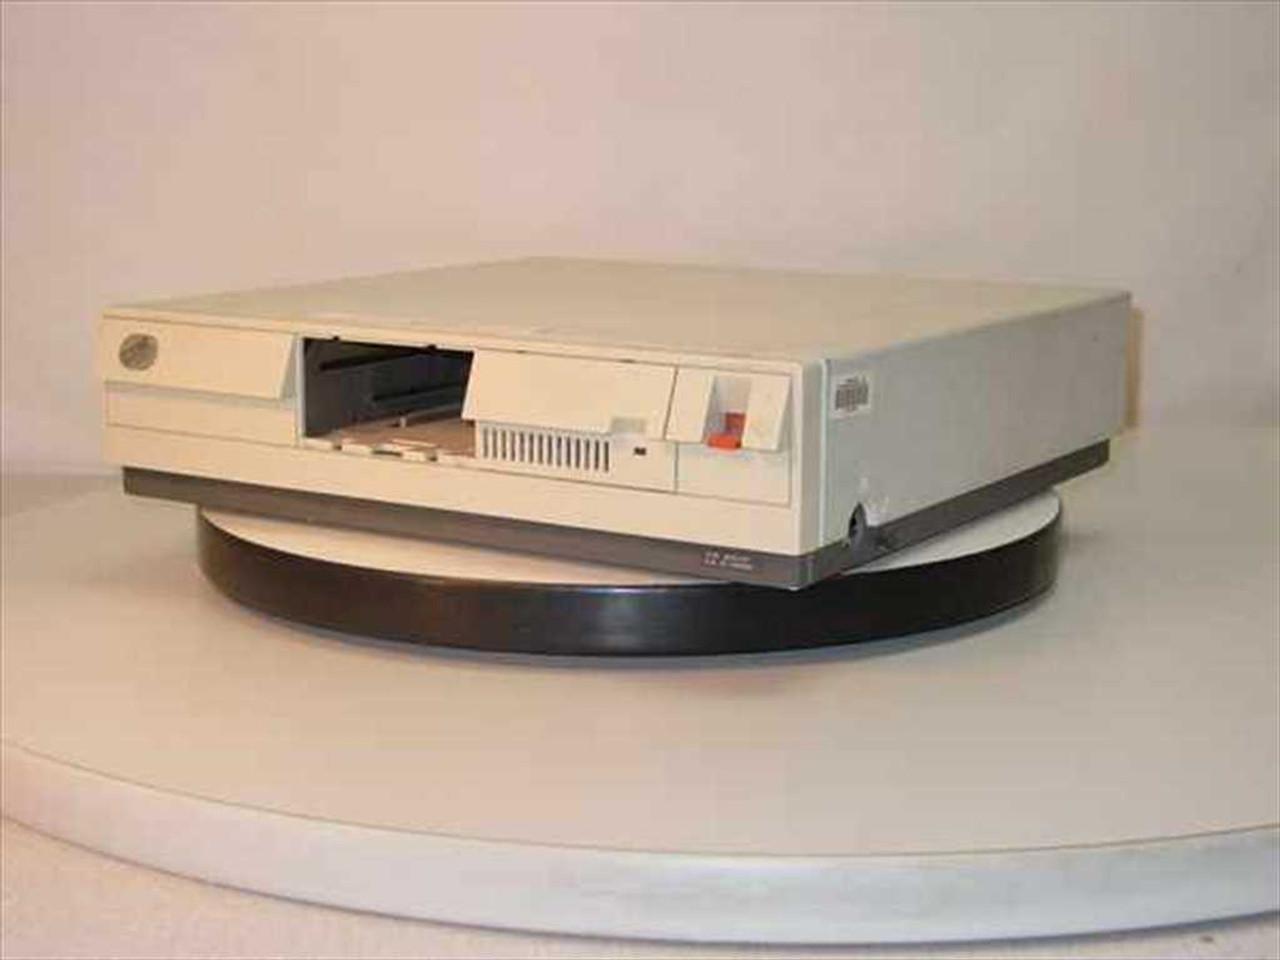 IBM 8530 Powersupply 61X8574 AA13610-61X8574 IBM